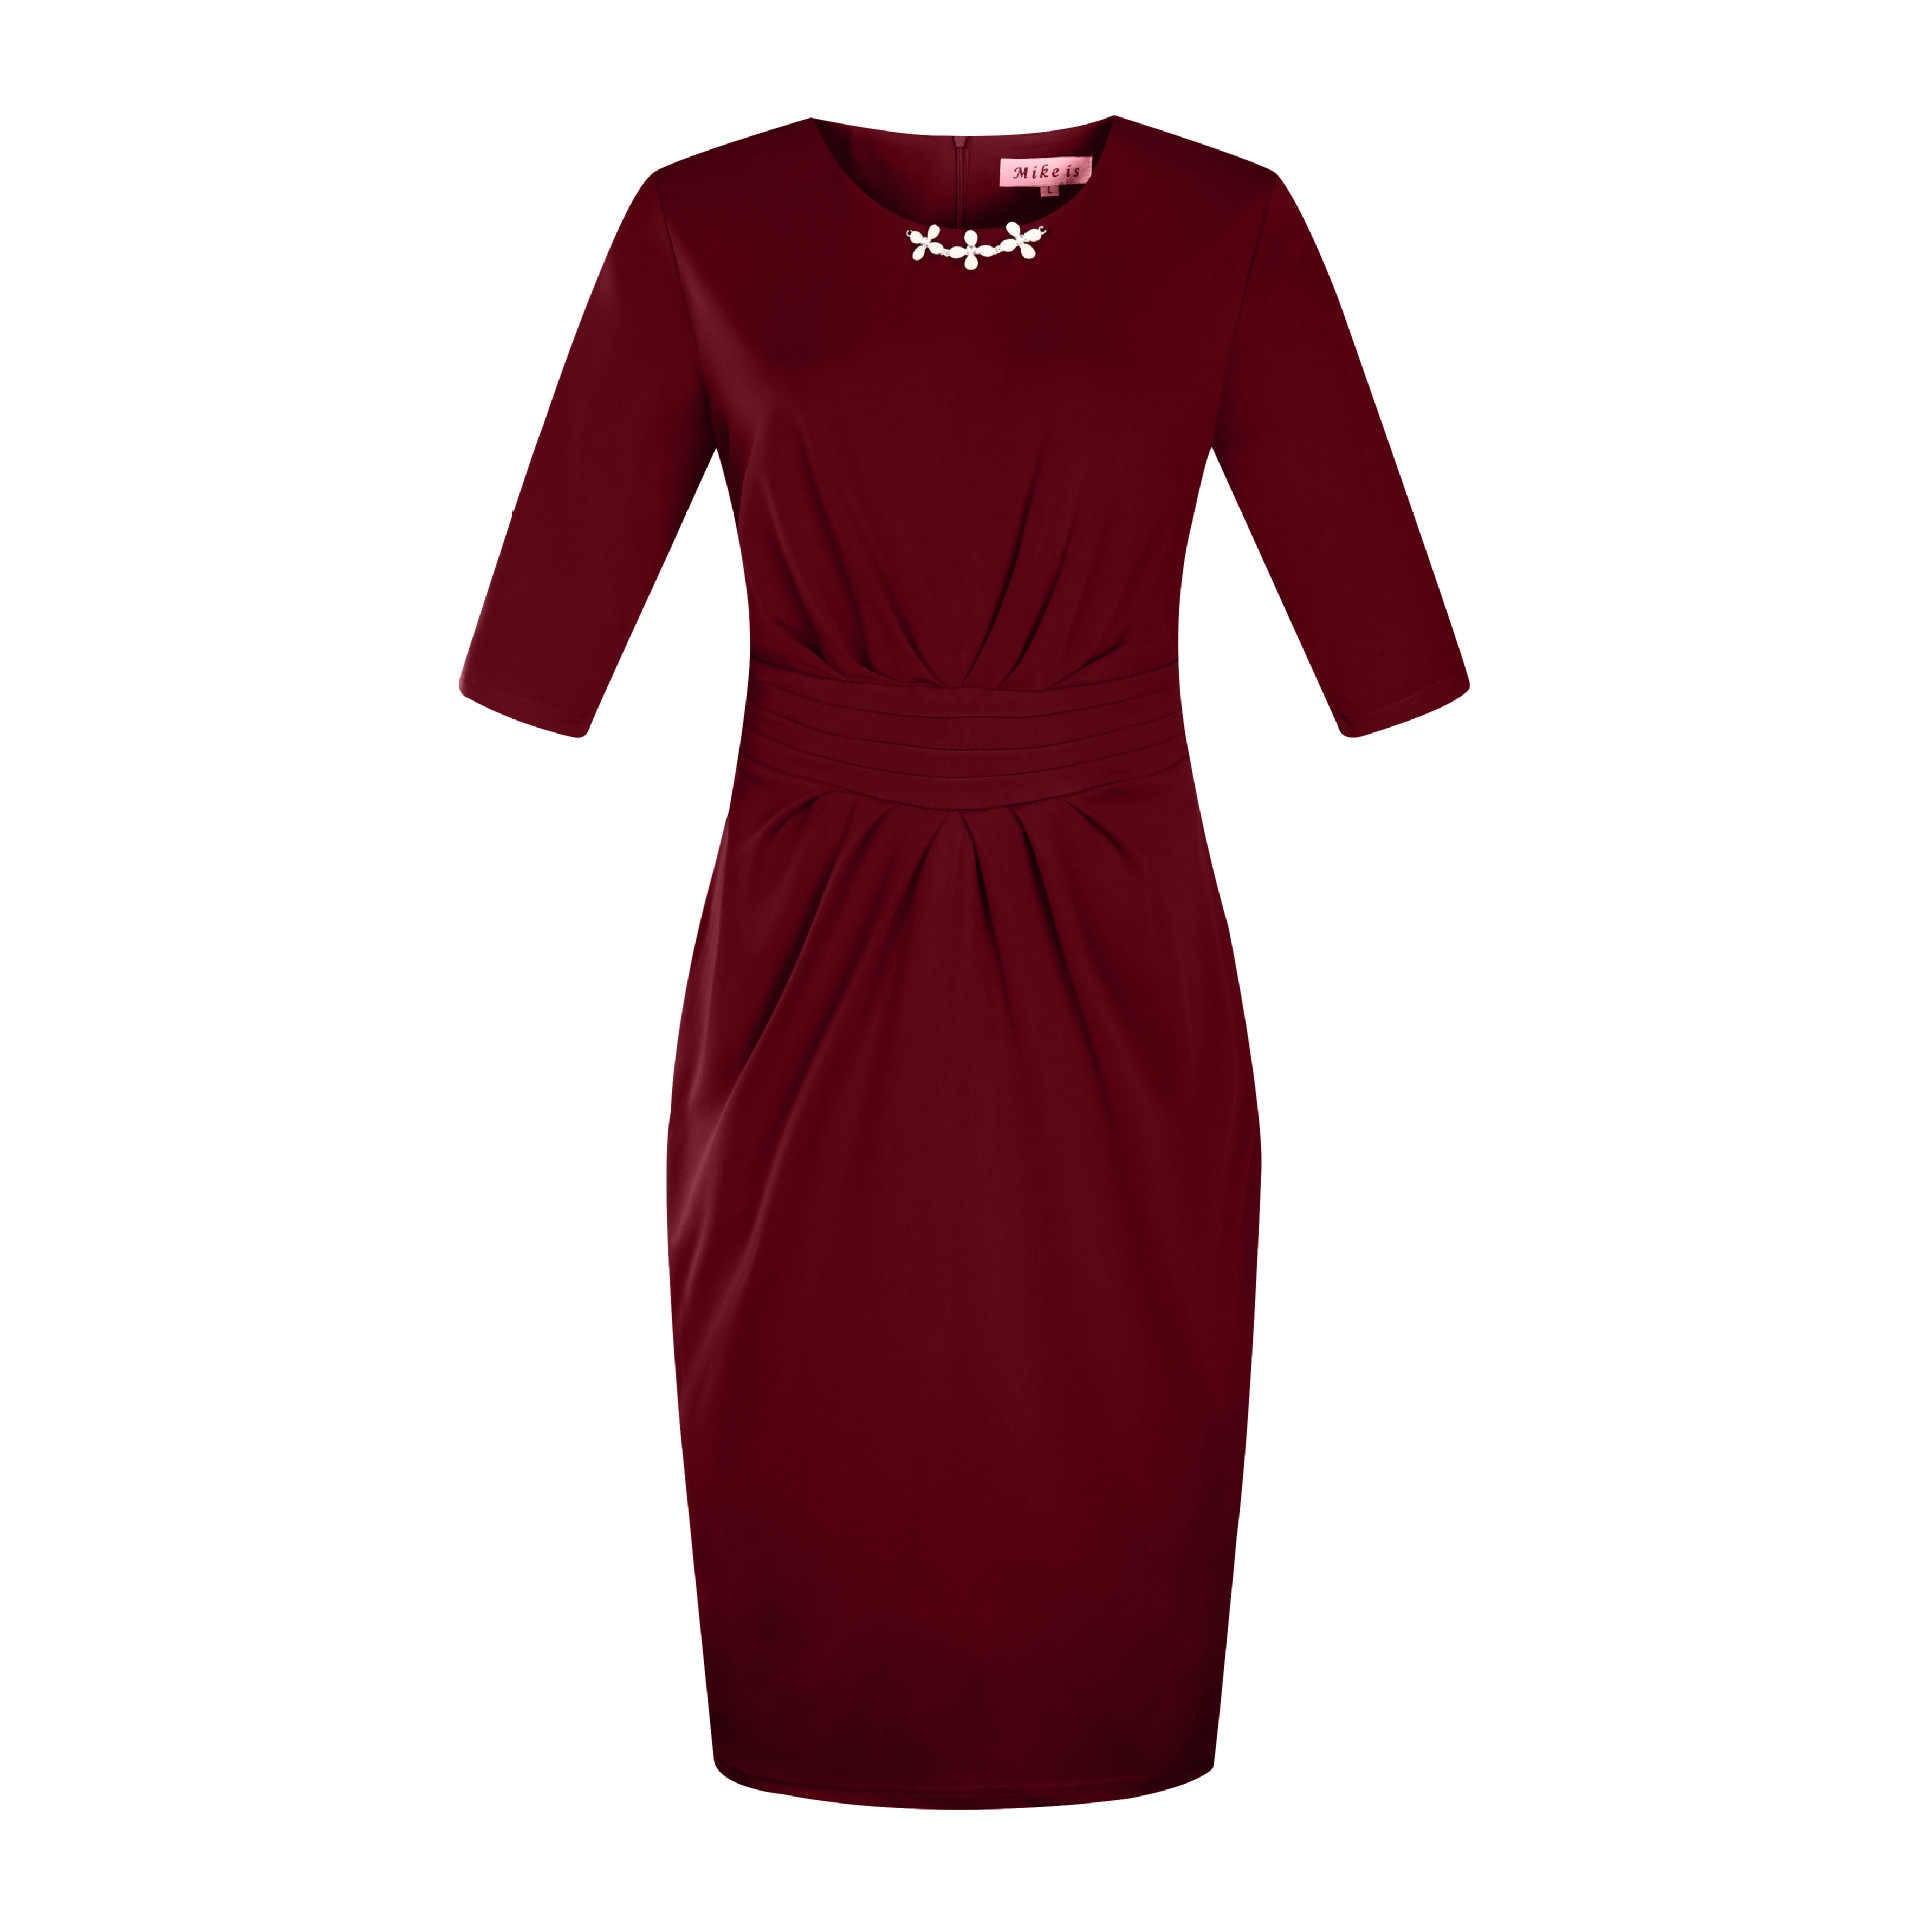 Ladies Pencil Dress Autumn 2017 Fall Beading Solid Vestidos Zipper Knee Length OL Work Cloth Plus Size Woman Dress 4XL 5XL 6XL